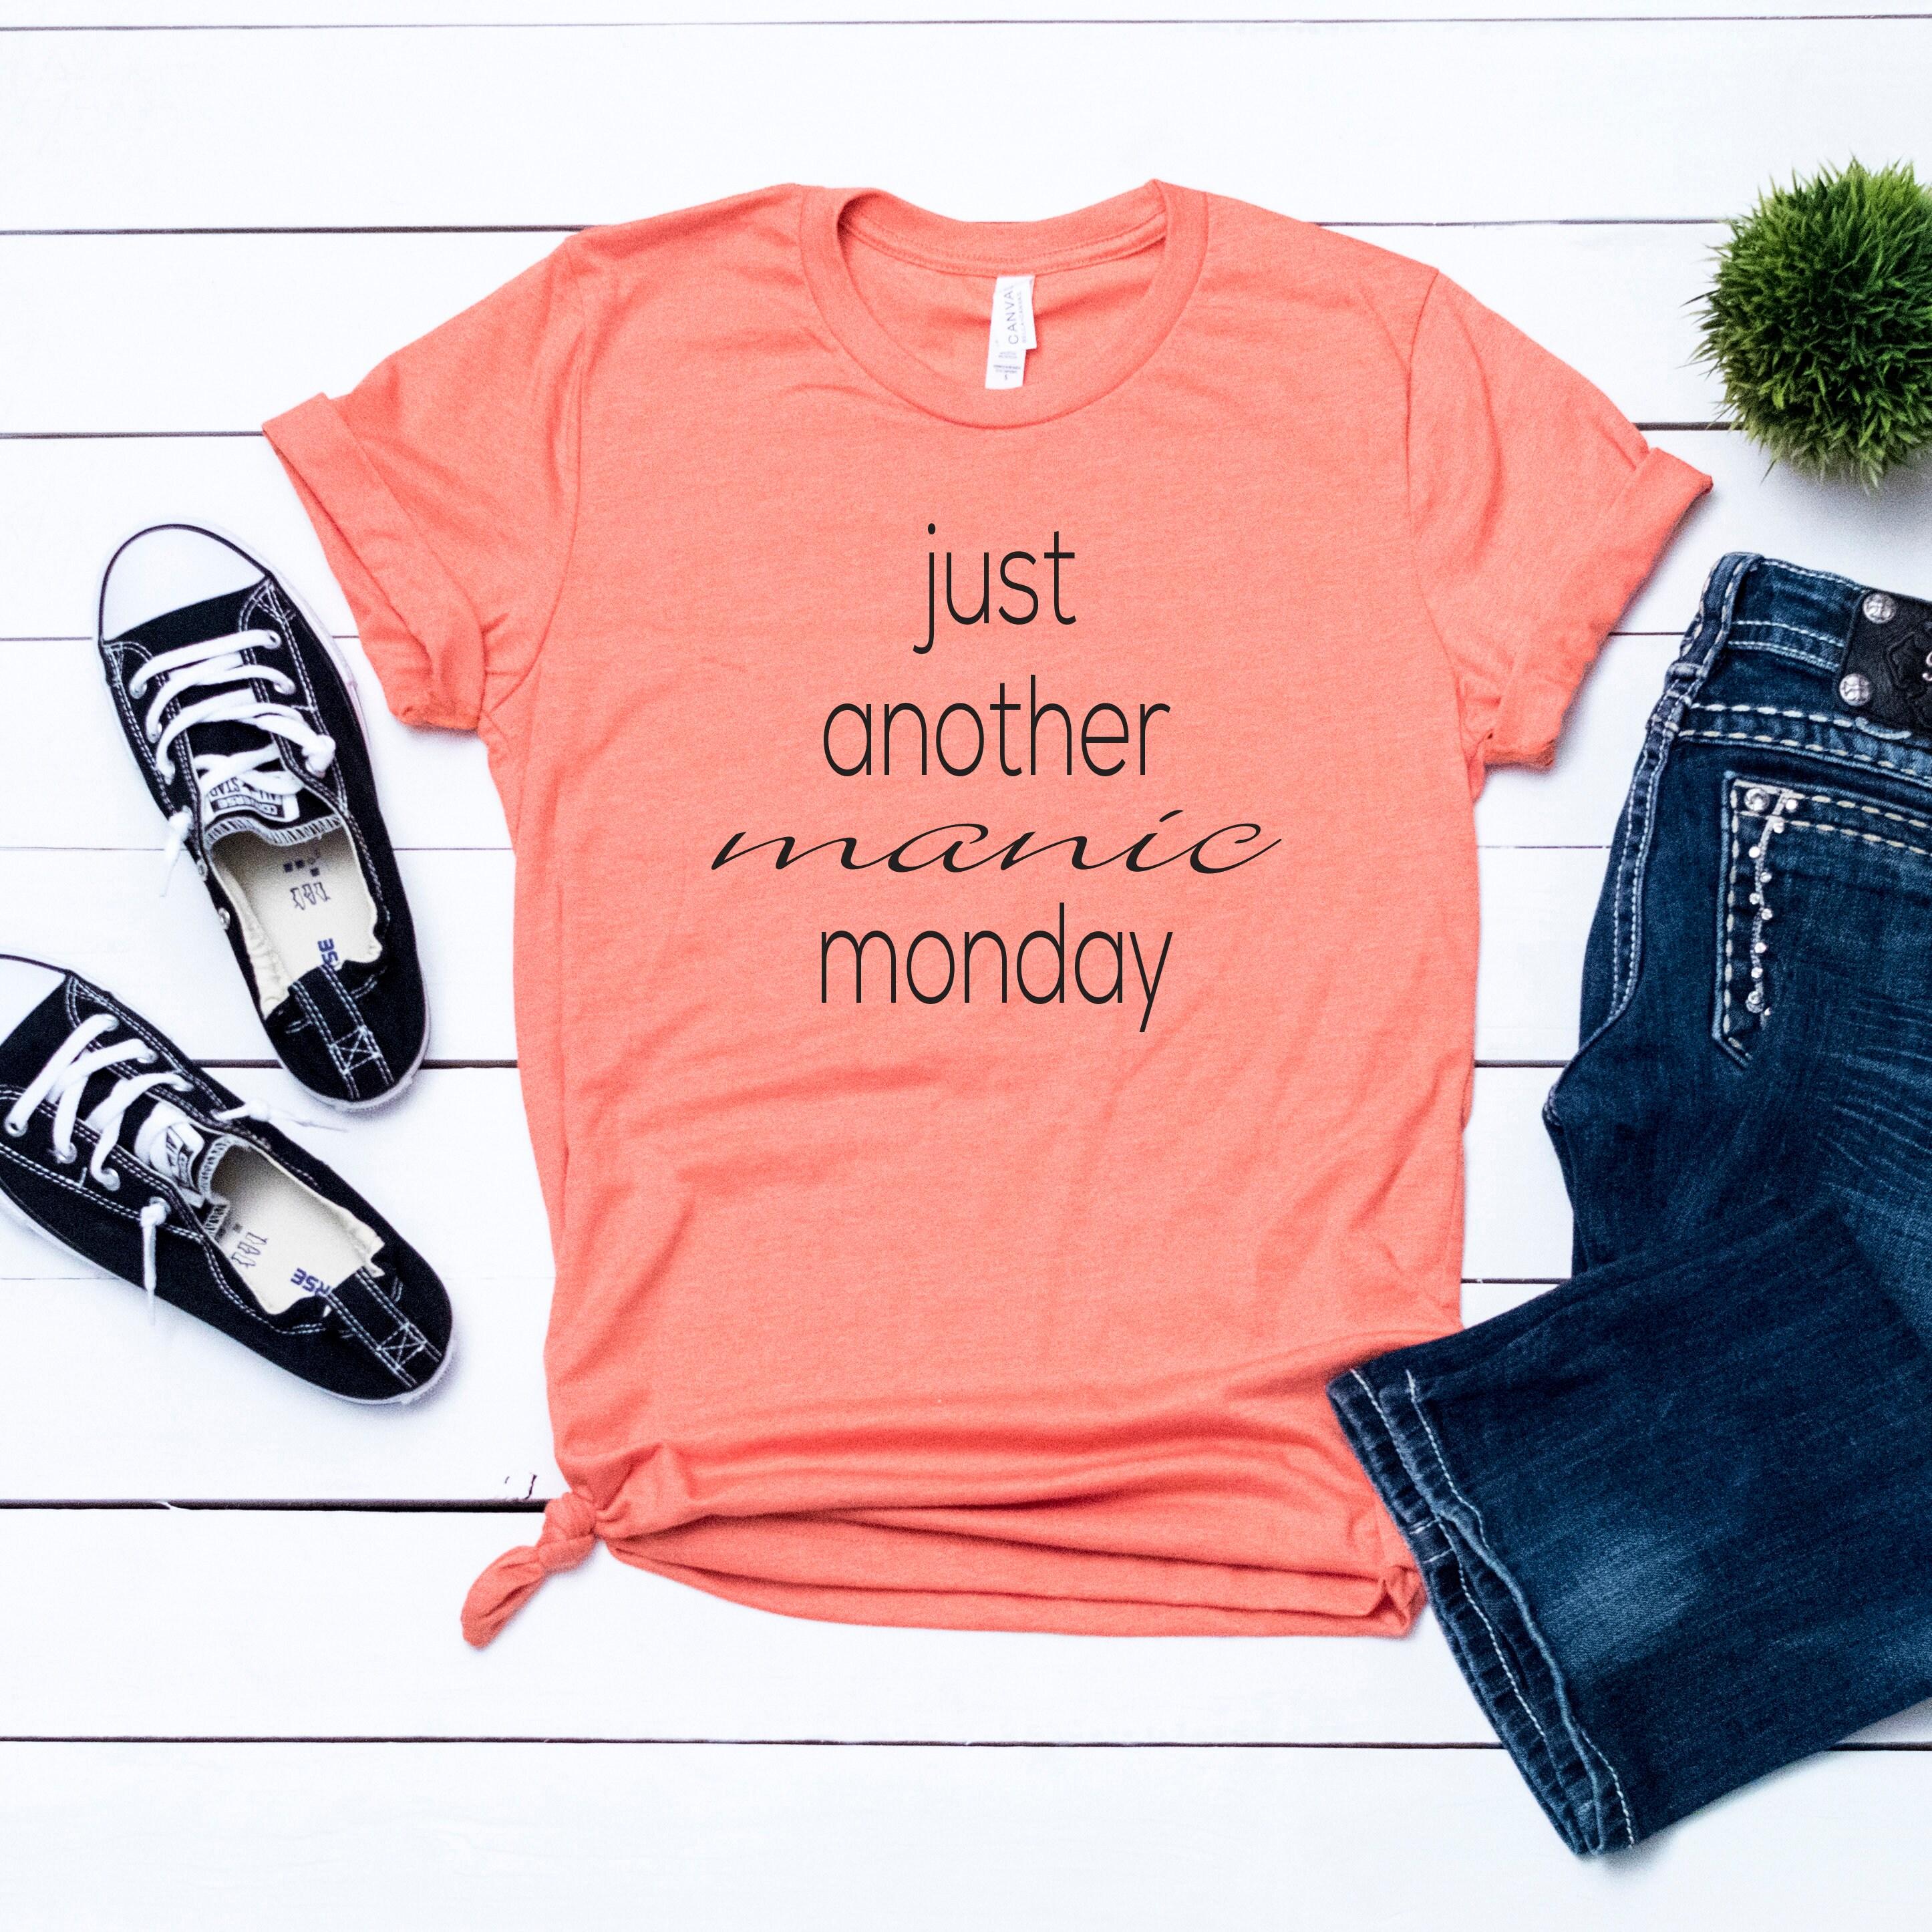 Manic Monday Shirt - Womens T-shirts - Womens Shirts - T-shirts For Women - Shirts With Sayings - Football Shirts For Women Unisex Tshirt